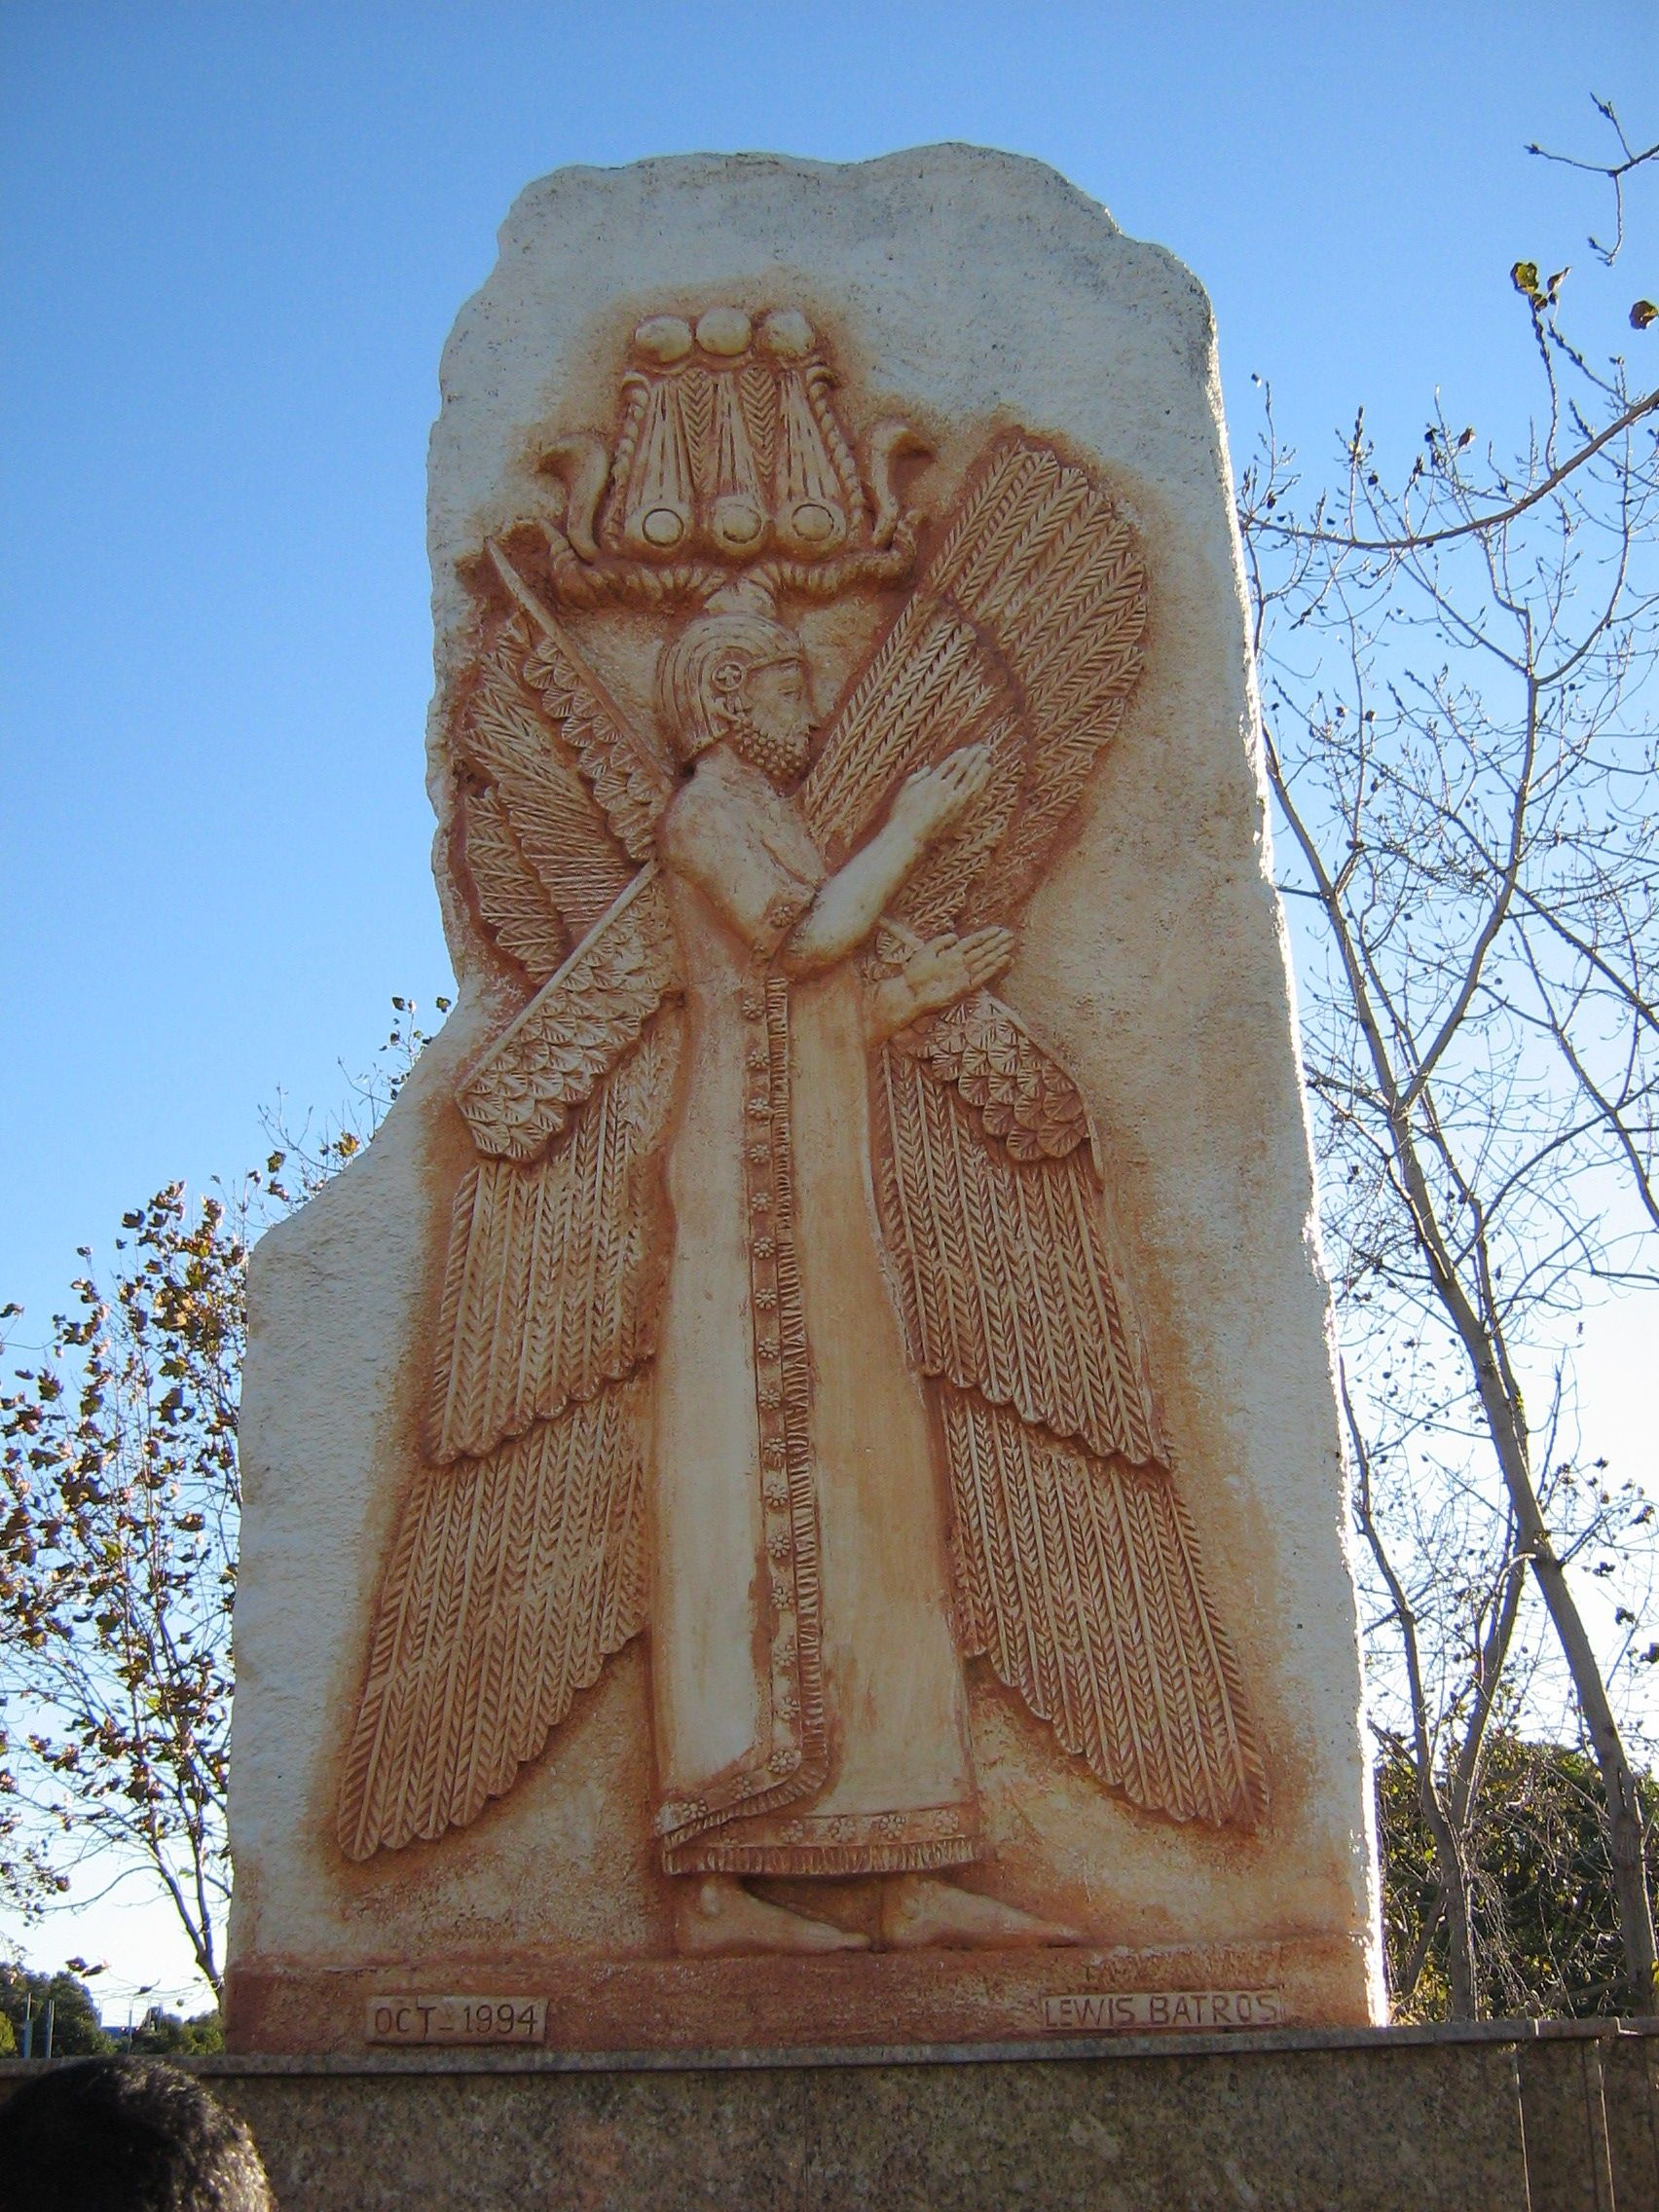 The Persian Empire of Ancient Iran